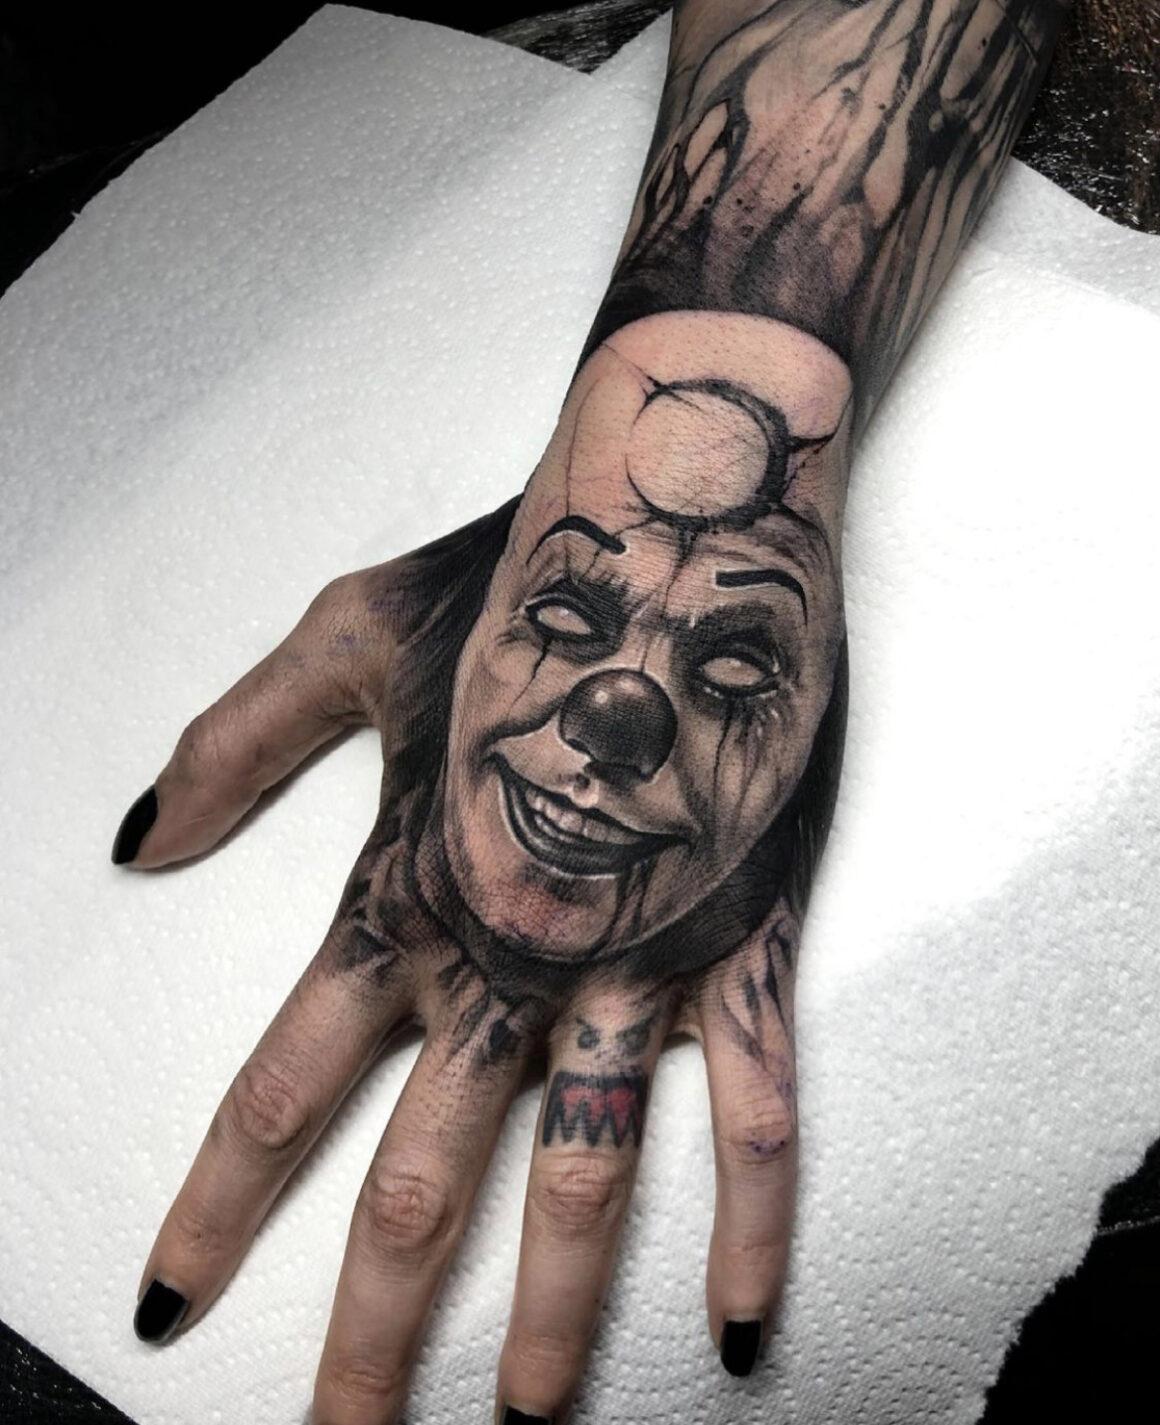 Anrijs Straume, Bold As Brass Tattoo, Liverpool, UK